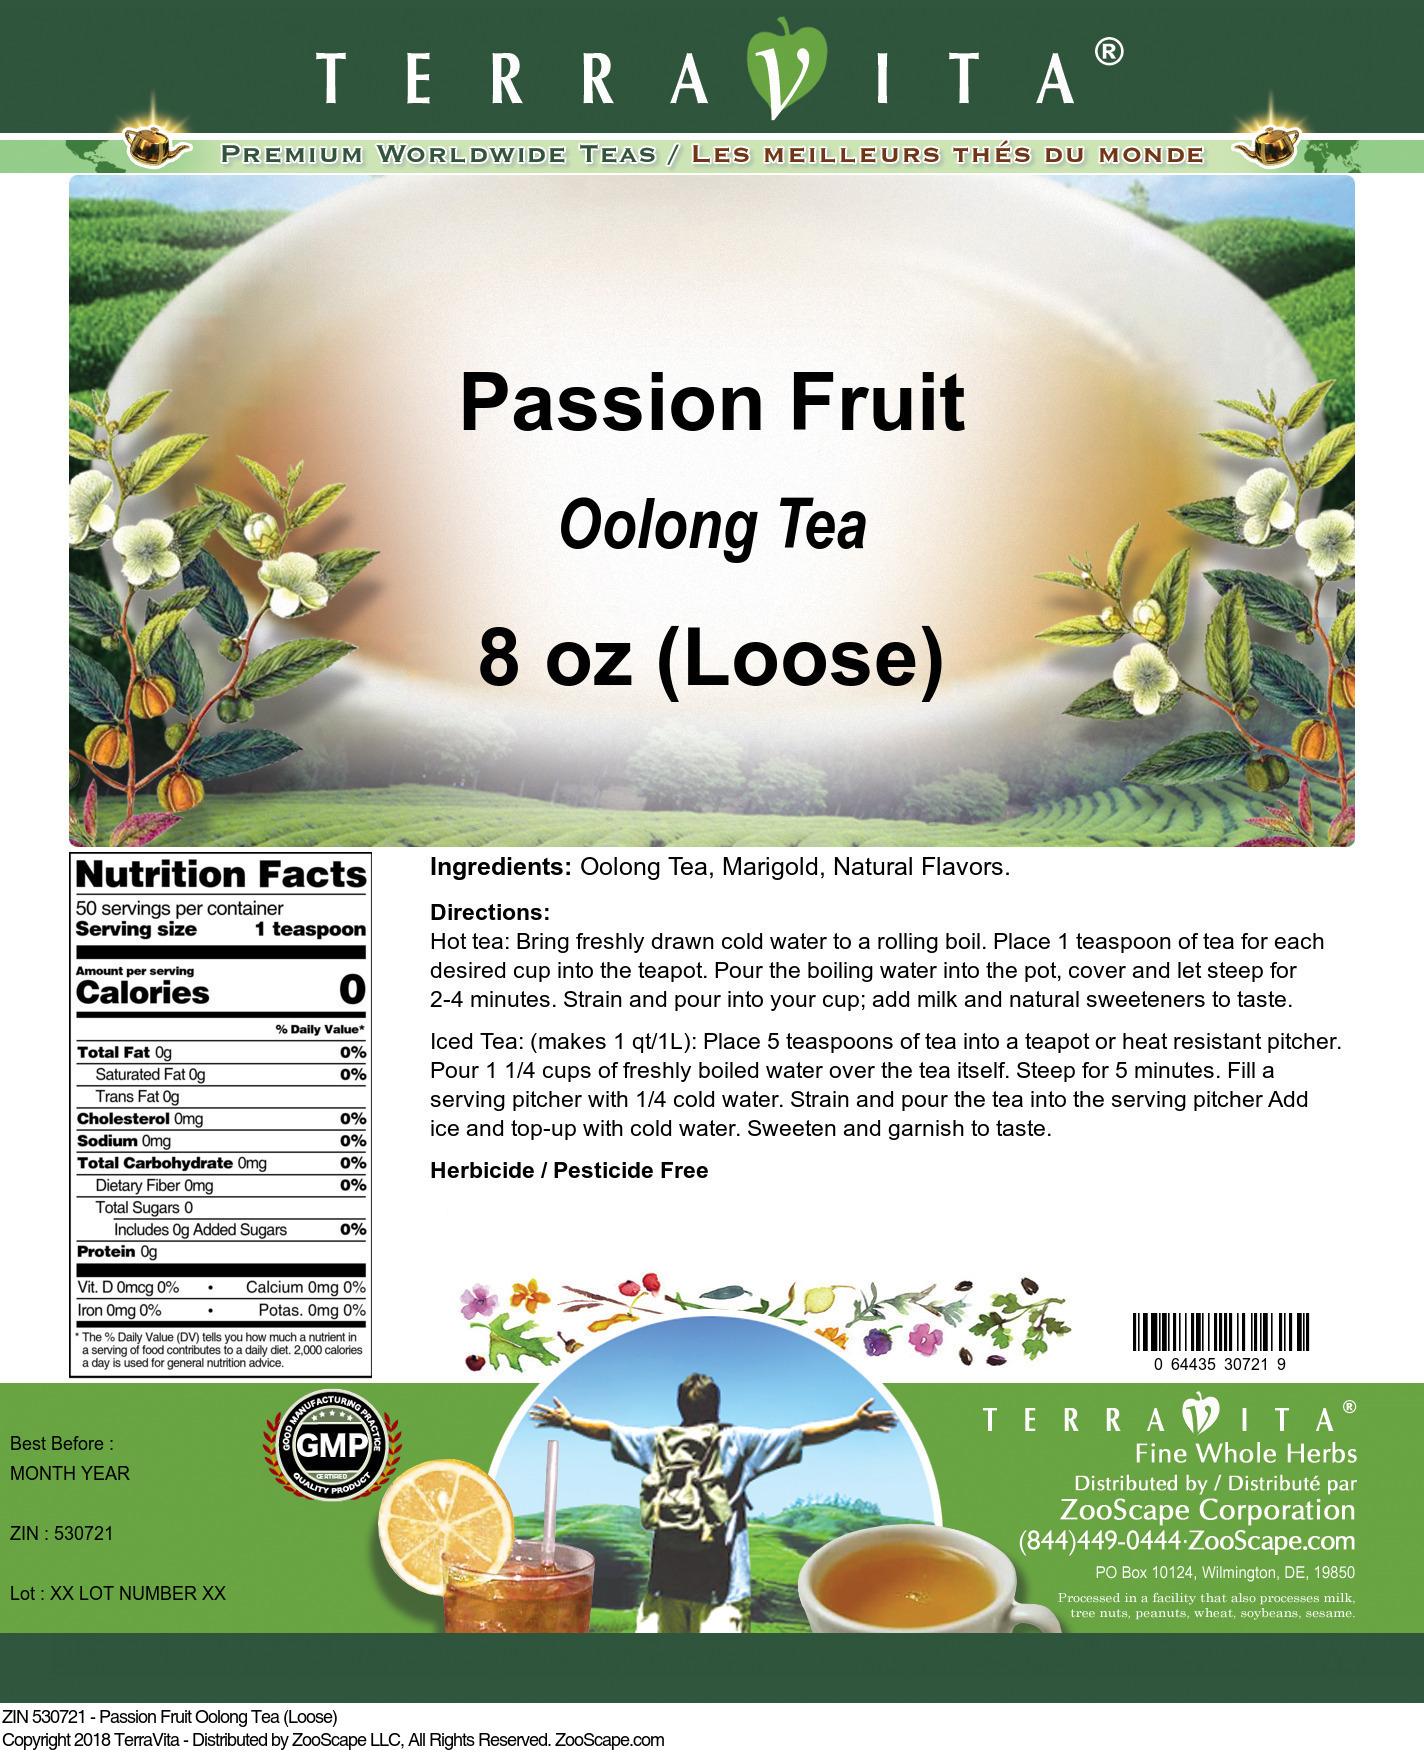 Passion Fruit Oolong Tea (Loose)